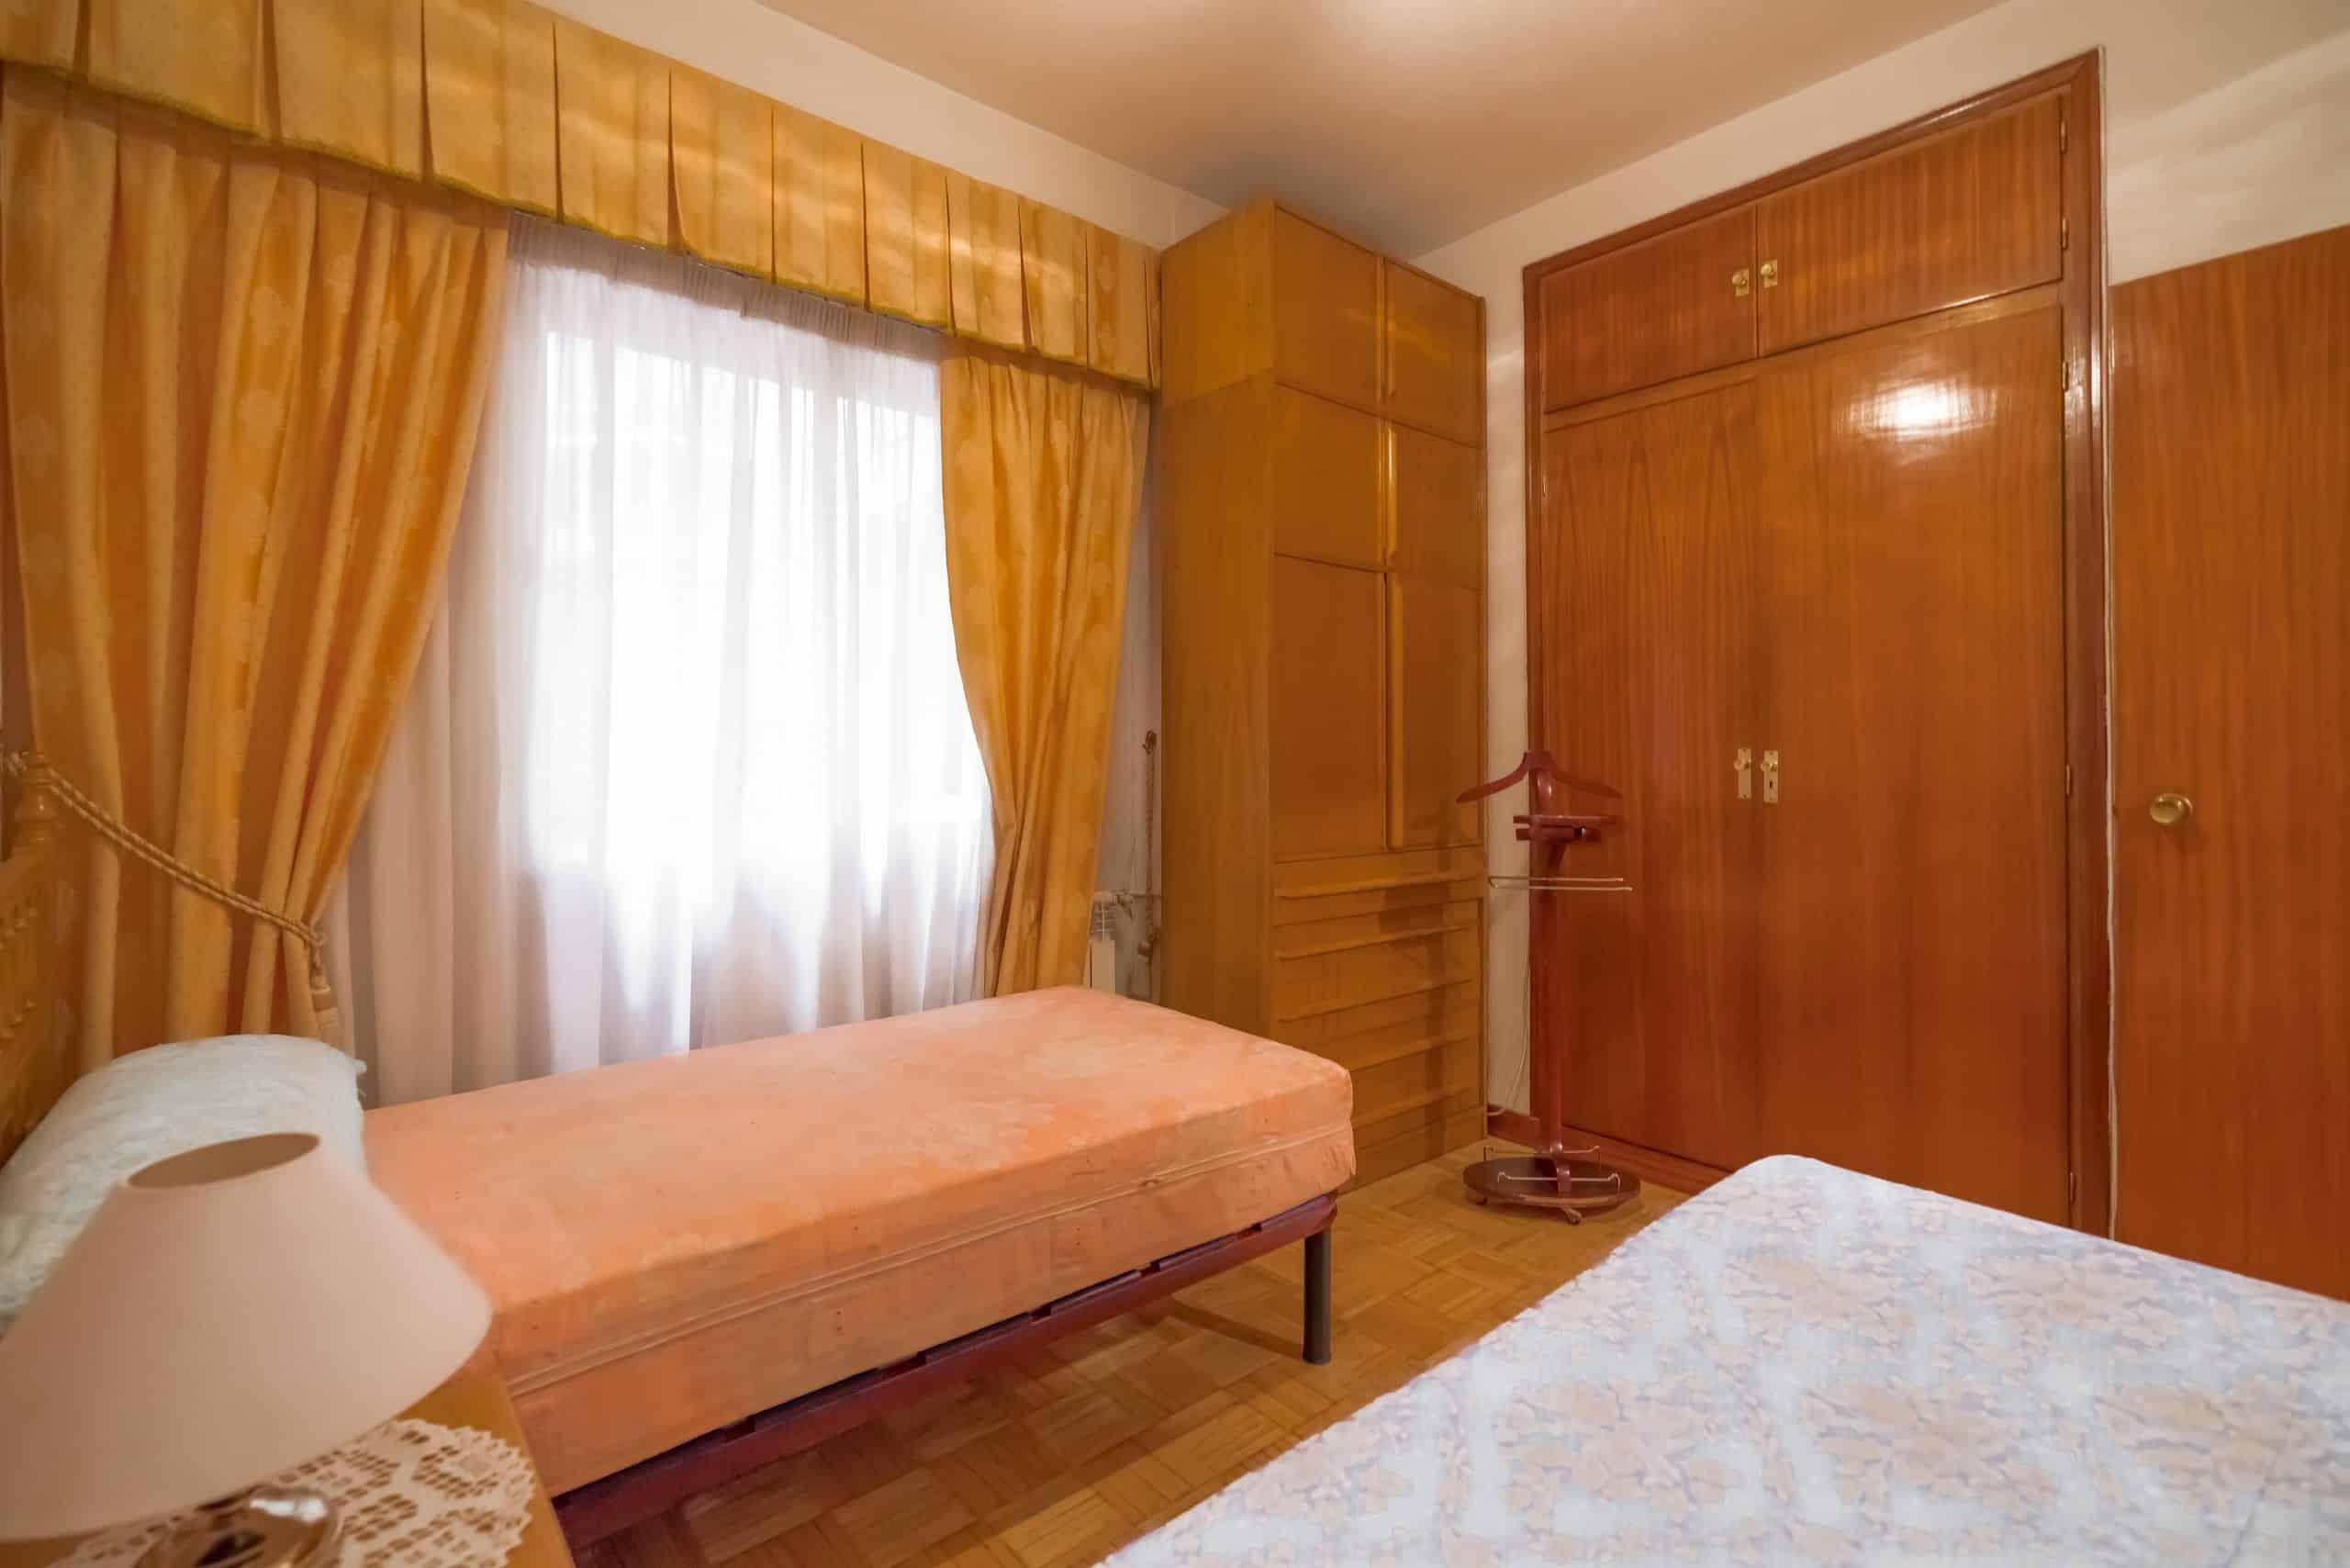 Agencia Inmobiliaria de Madrid-FUTUROCASA-Zona ARGANZUELA-EMBAJADORES-LEGAZPI -calle tomas borras- dormitorio-1